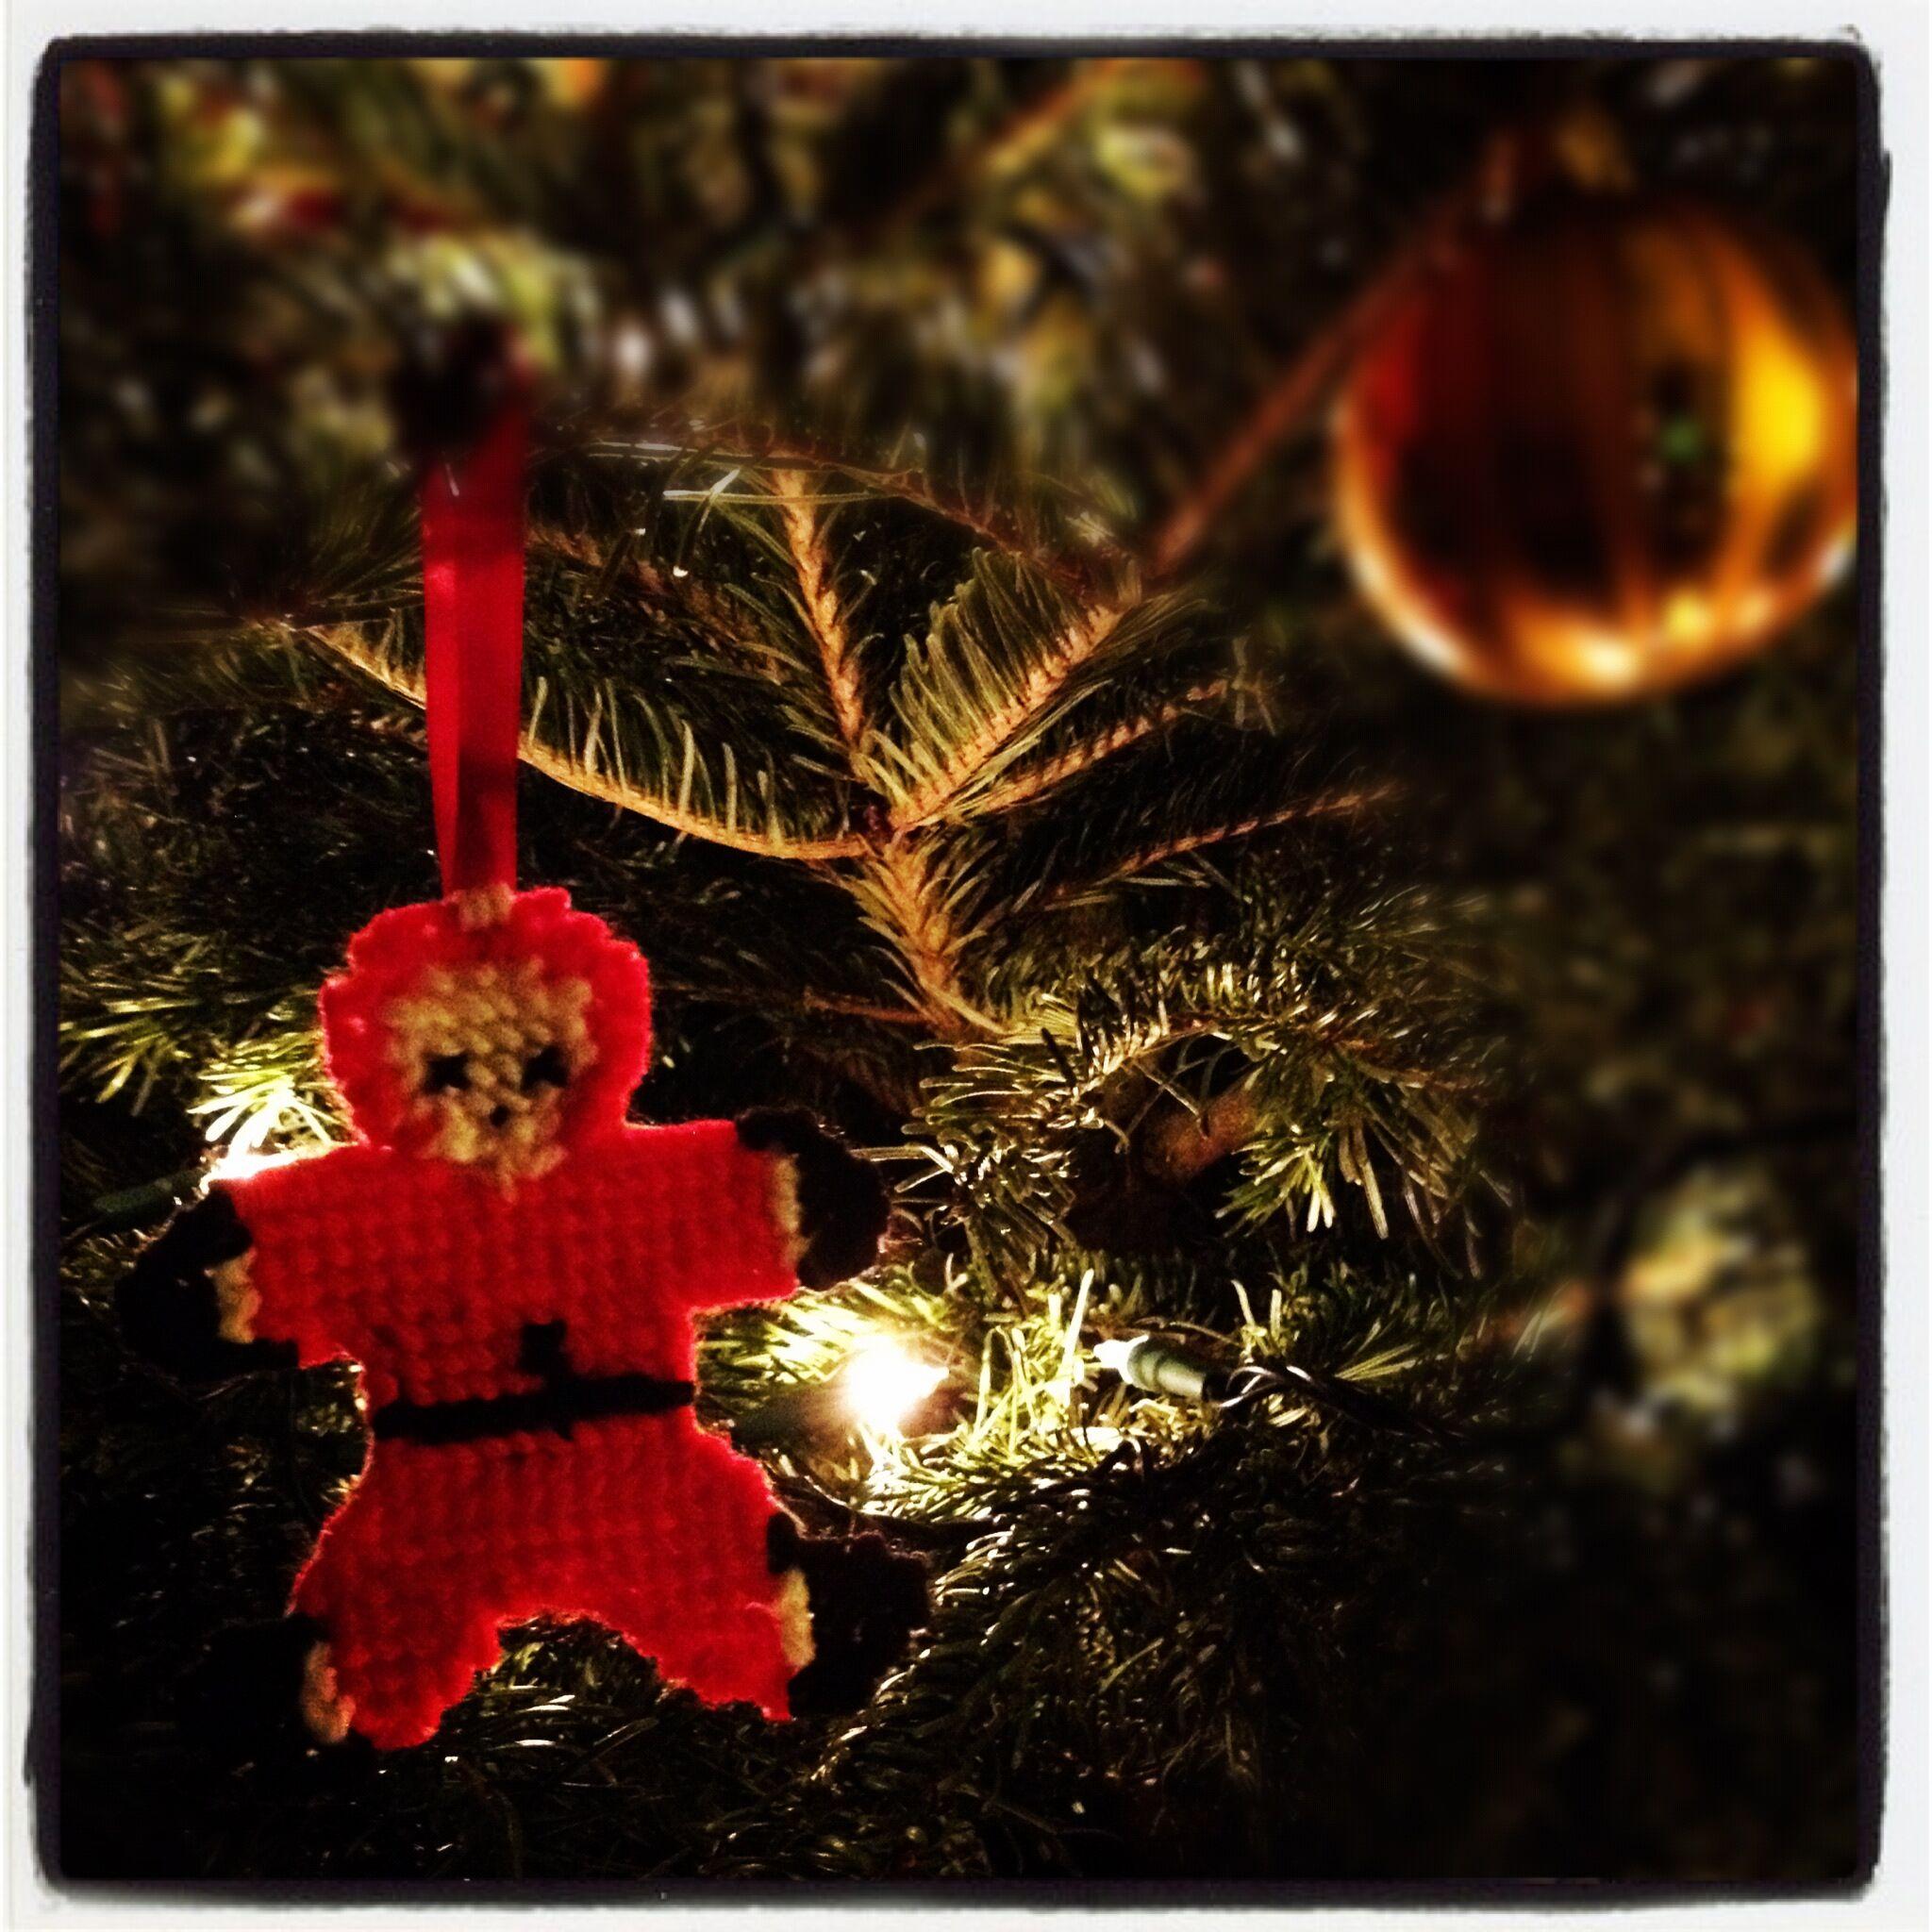 Christmasdecoration.jpg